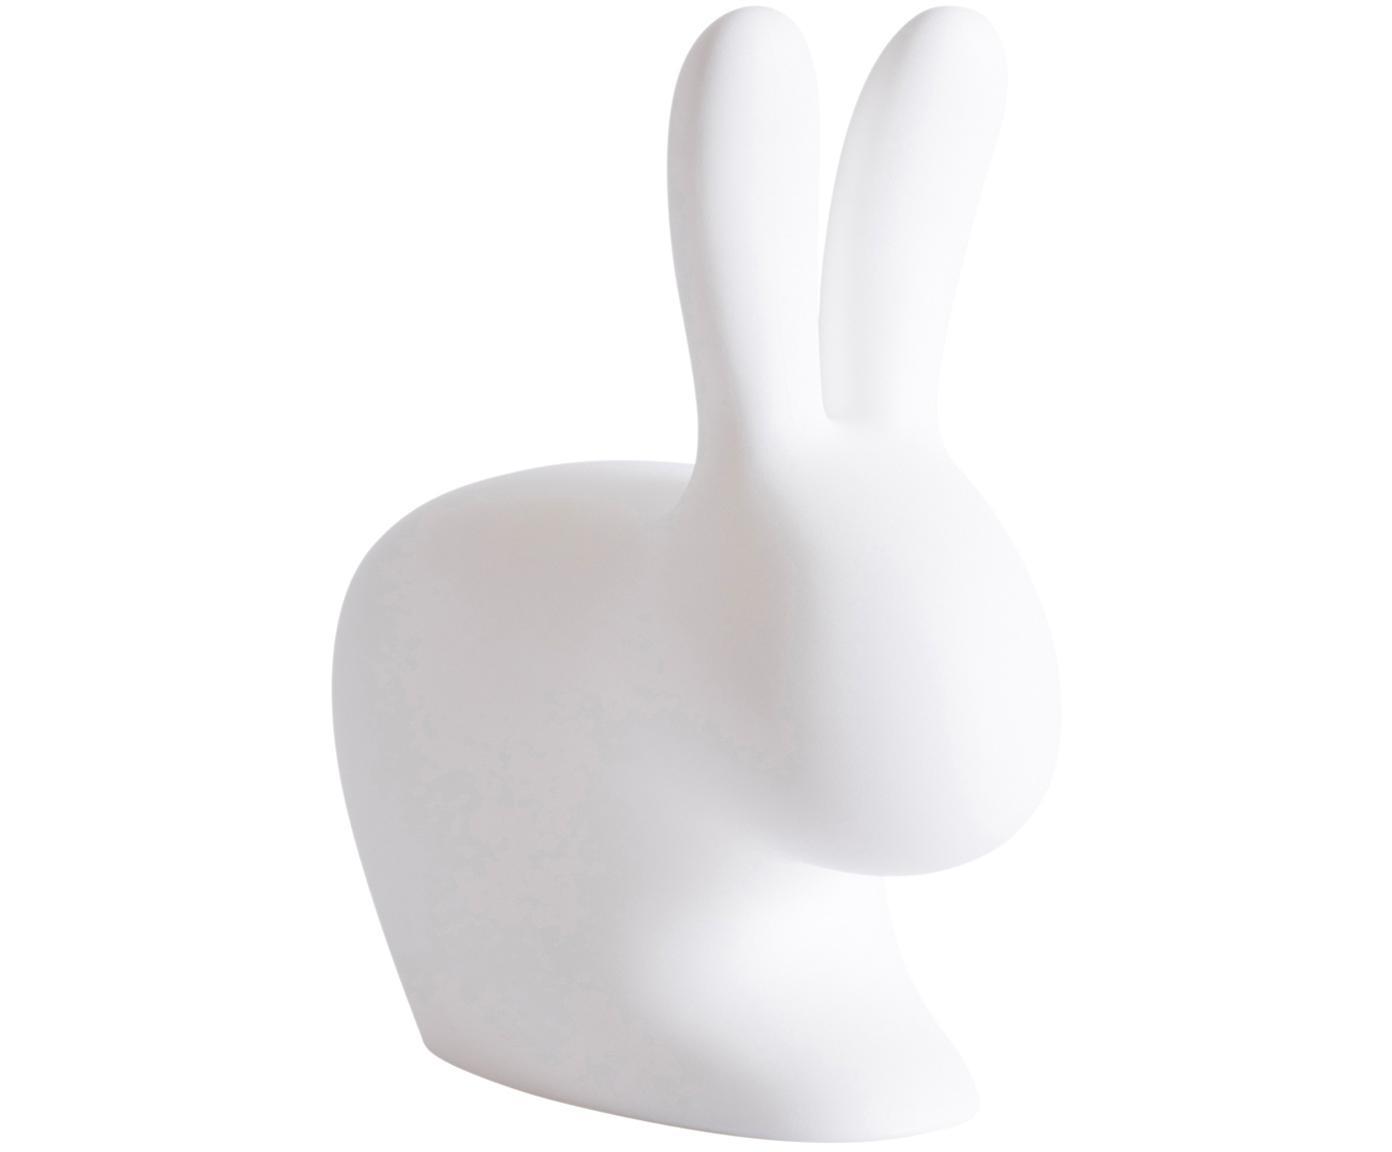 Outdoor LED tafellamp Rabbit, Kunststof (polyethyleen), Wit, 45 x 53 cm